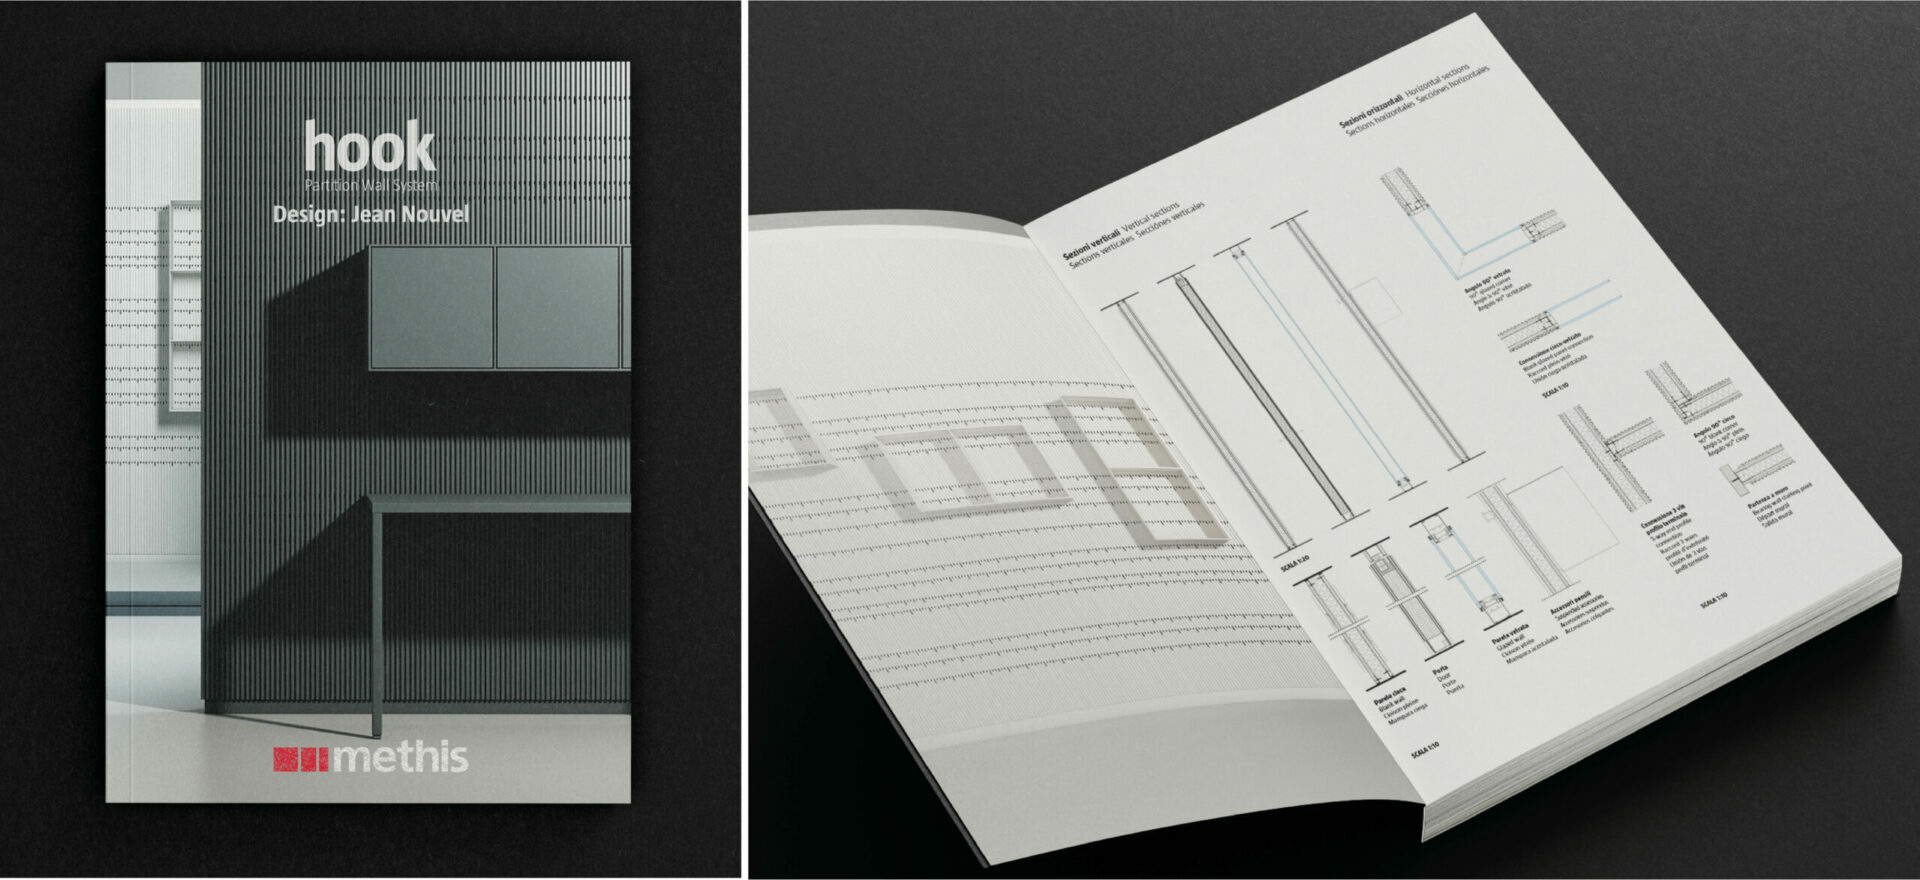 Logo | Graphic Design | Branding | Jean Nouvel Hook Catalogue | Methis | Mario Trimarchi Design | Fragile